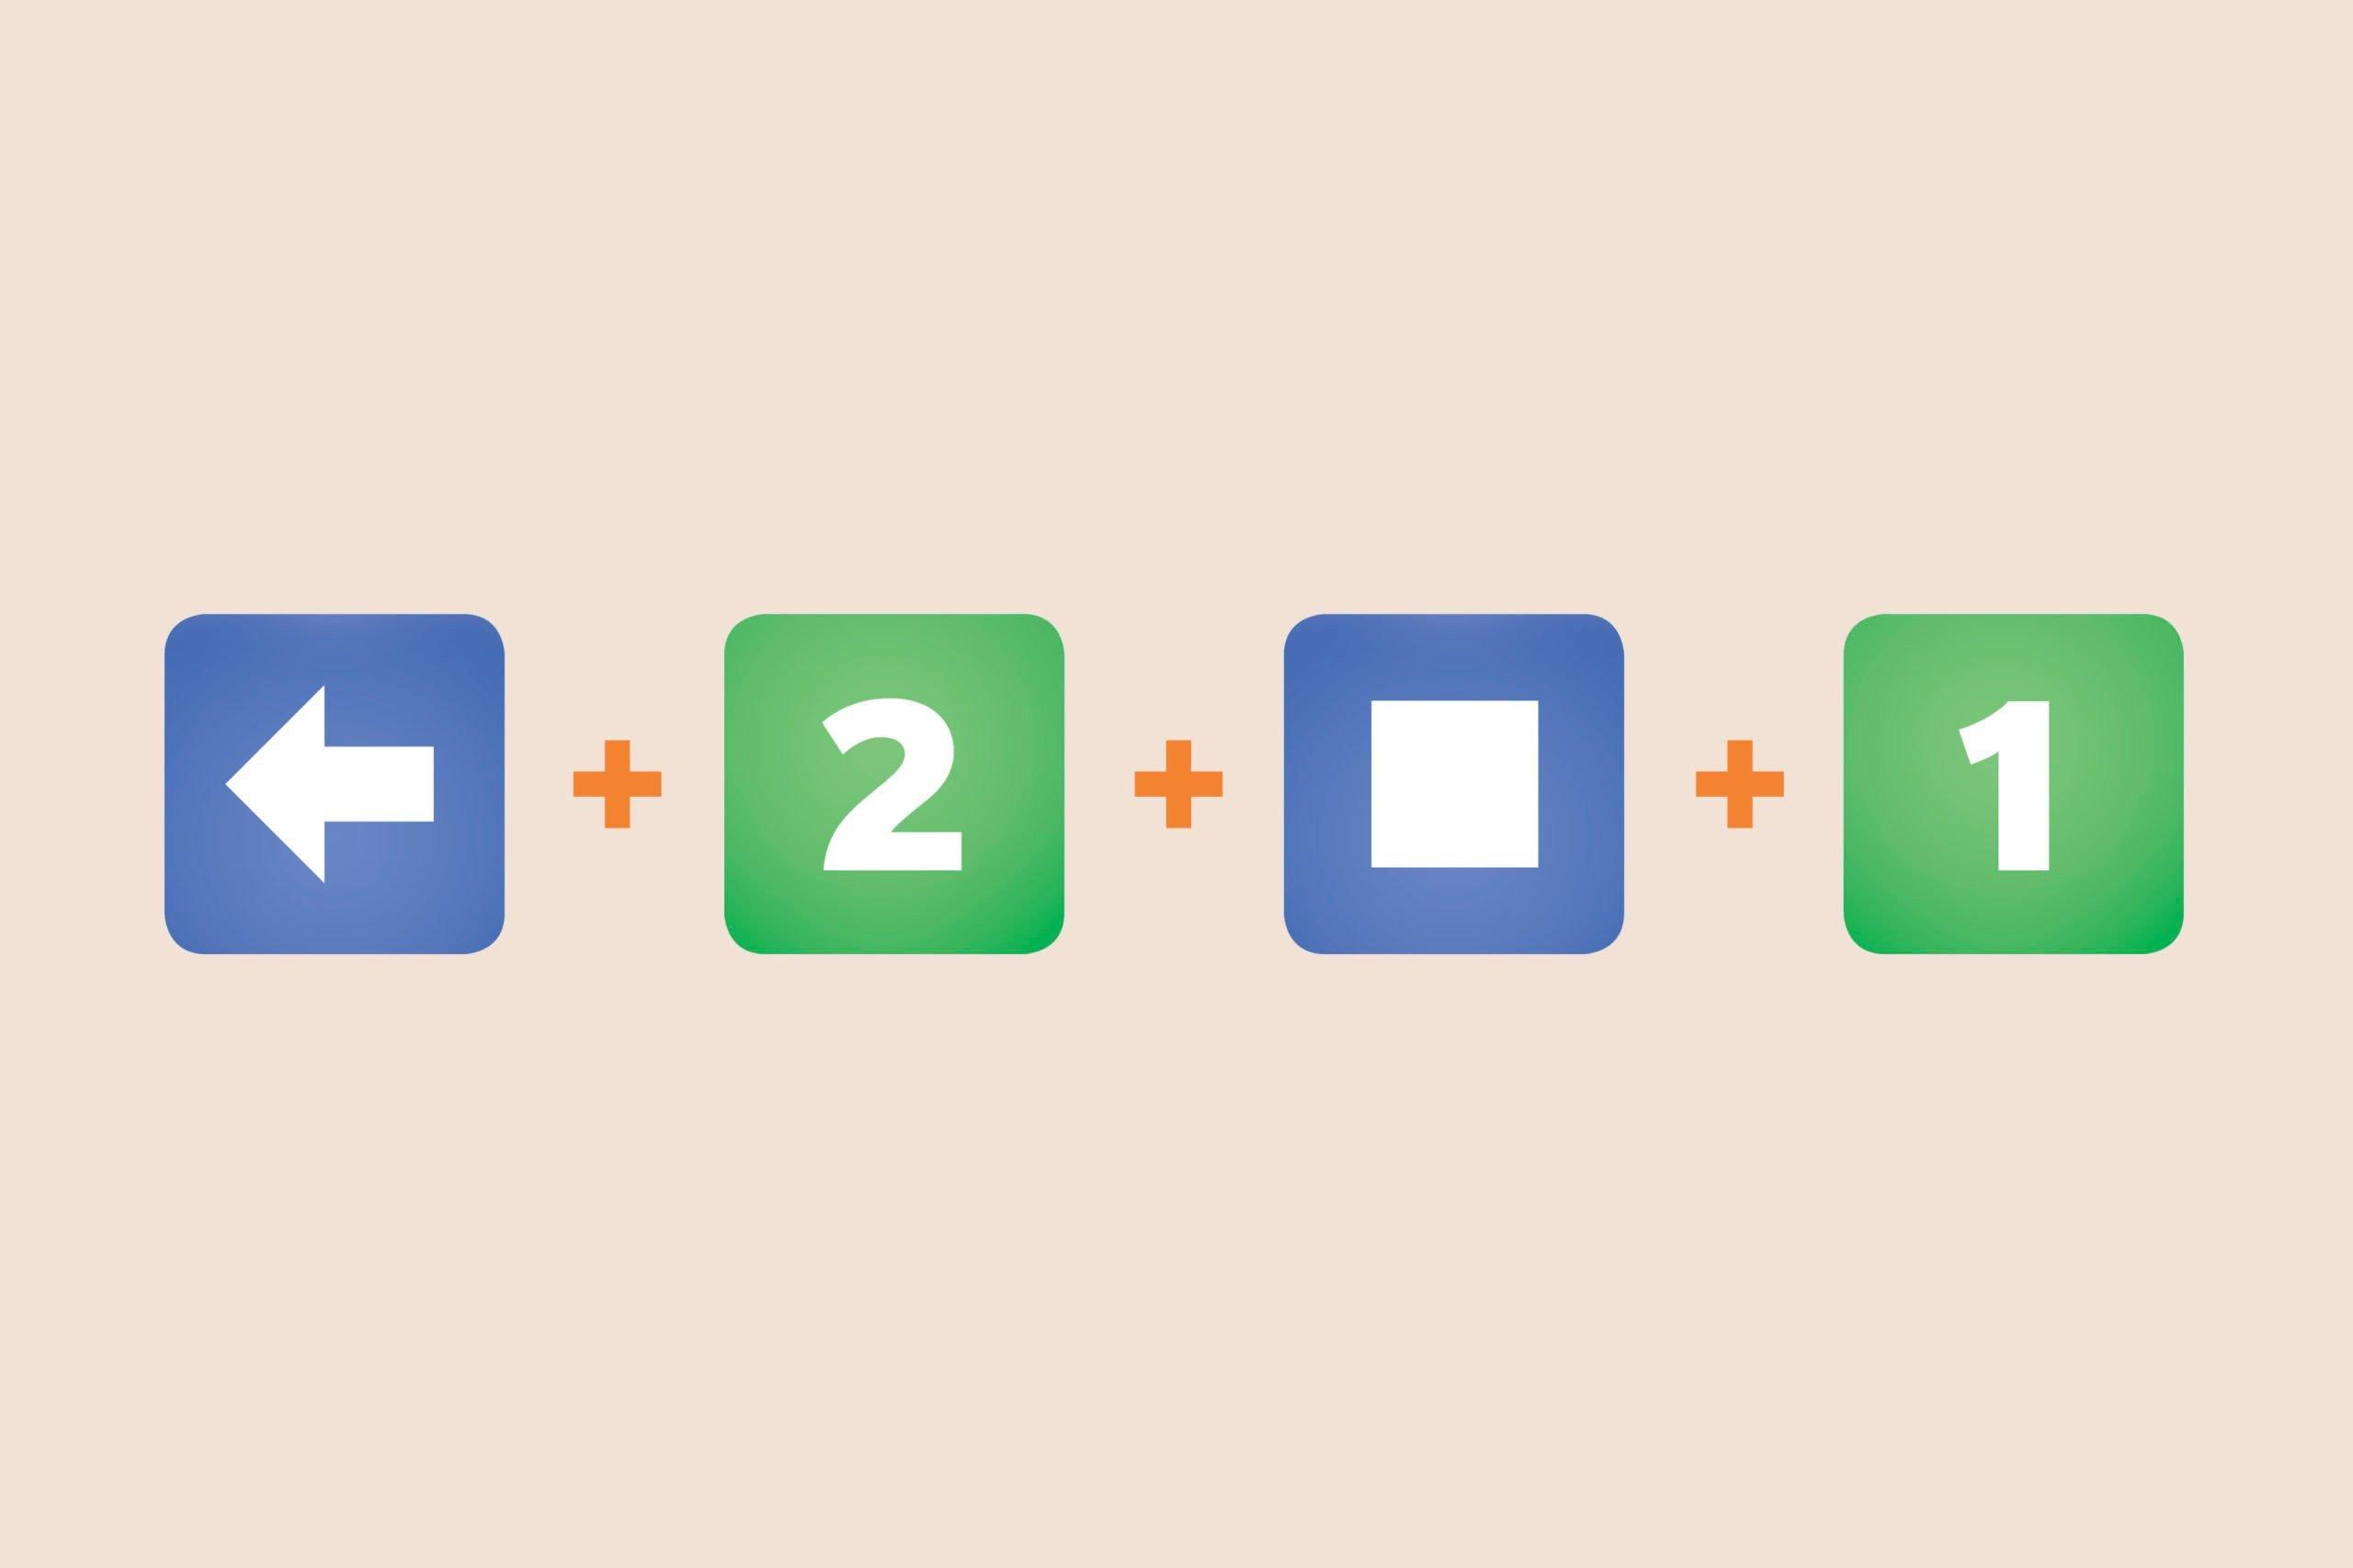 Arrow pointing left emoji + Number 2 emoji + square emoji + Number 1 emoji